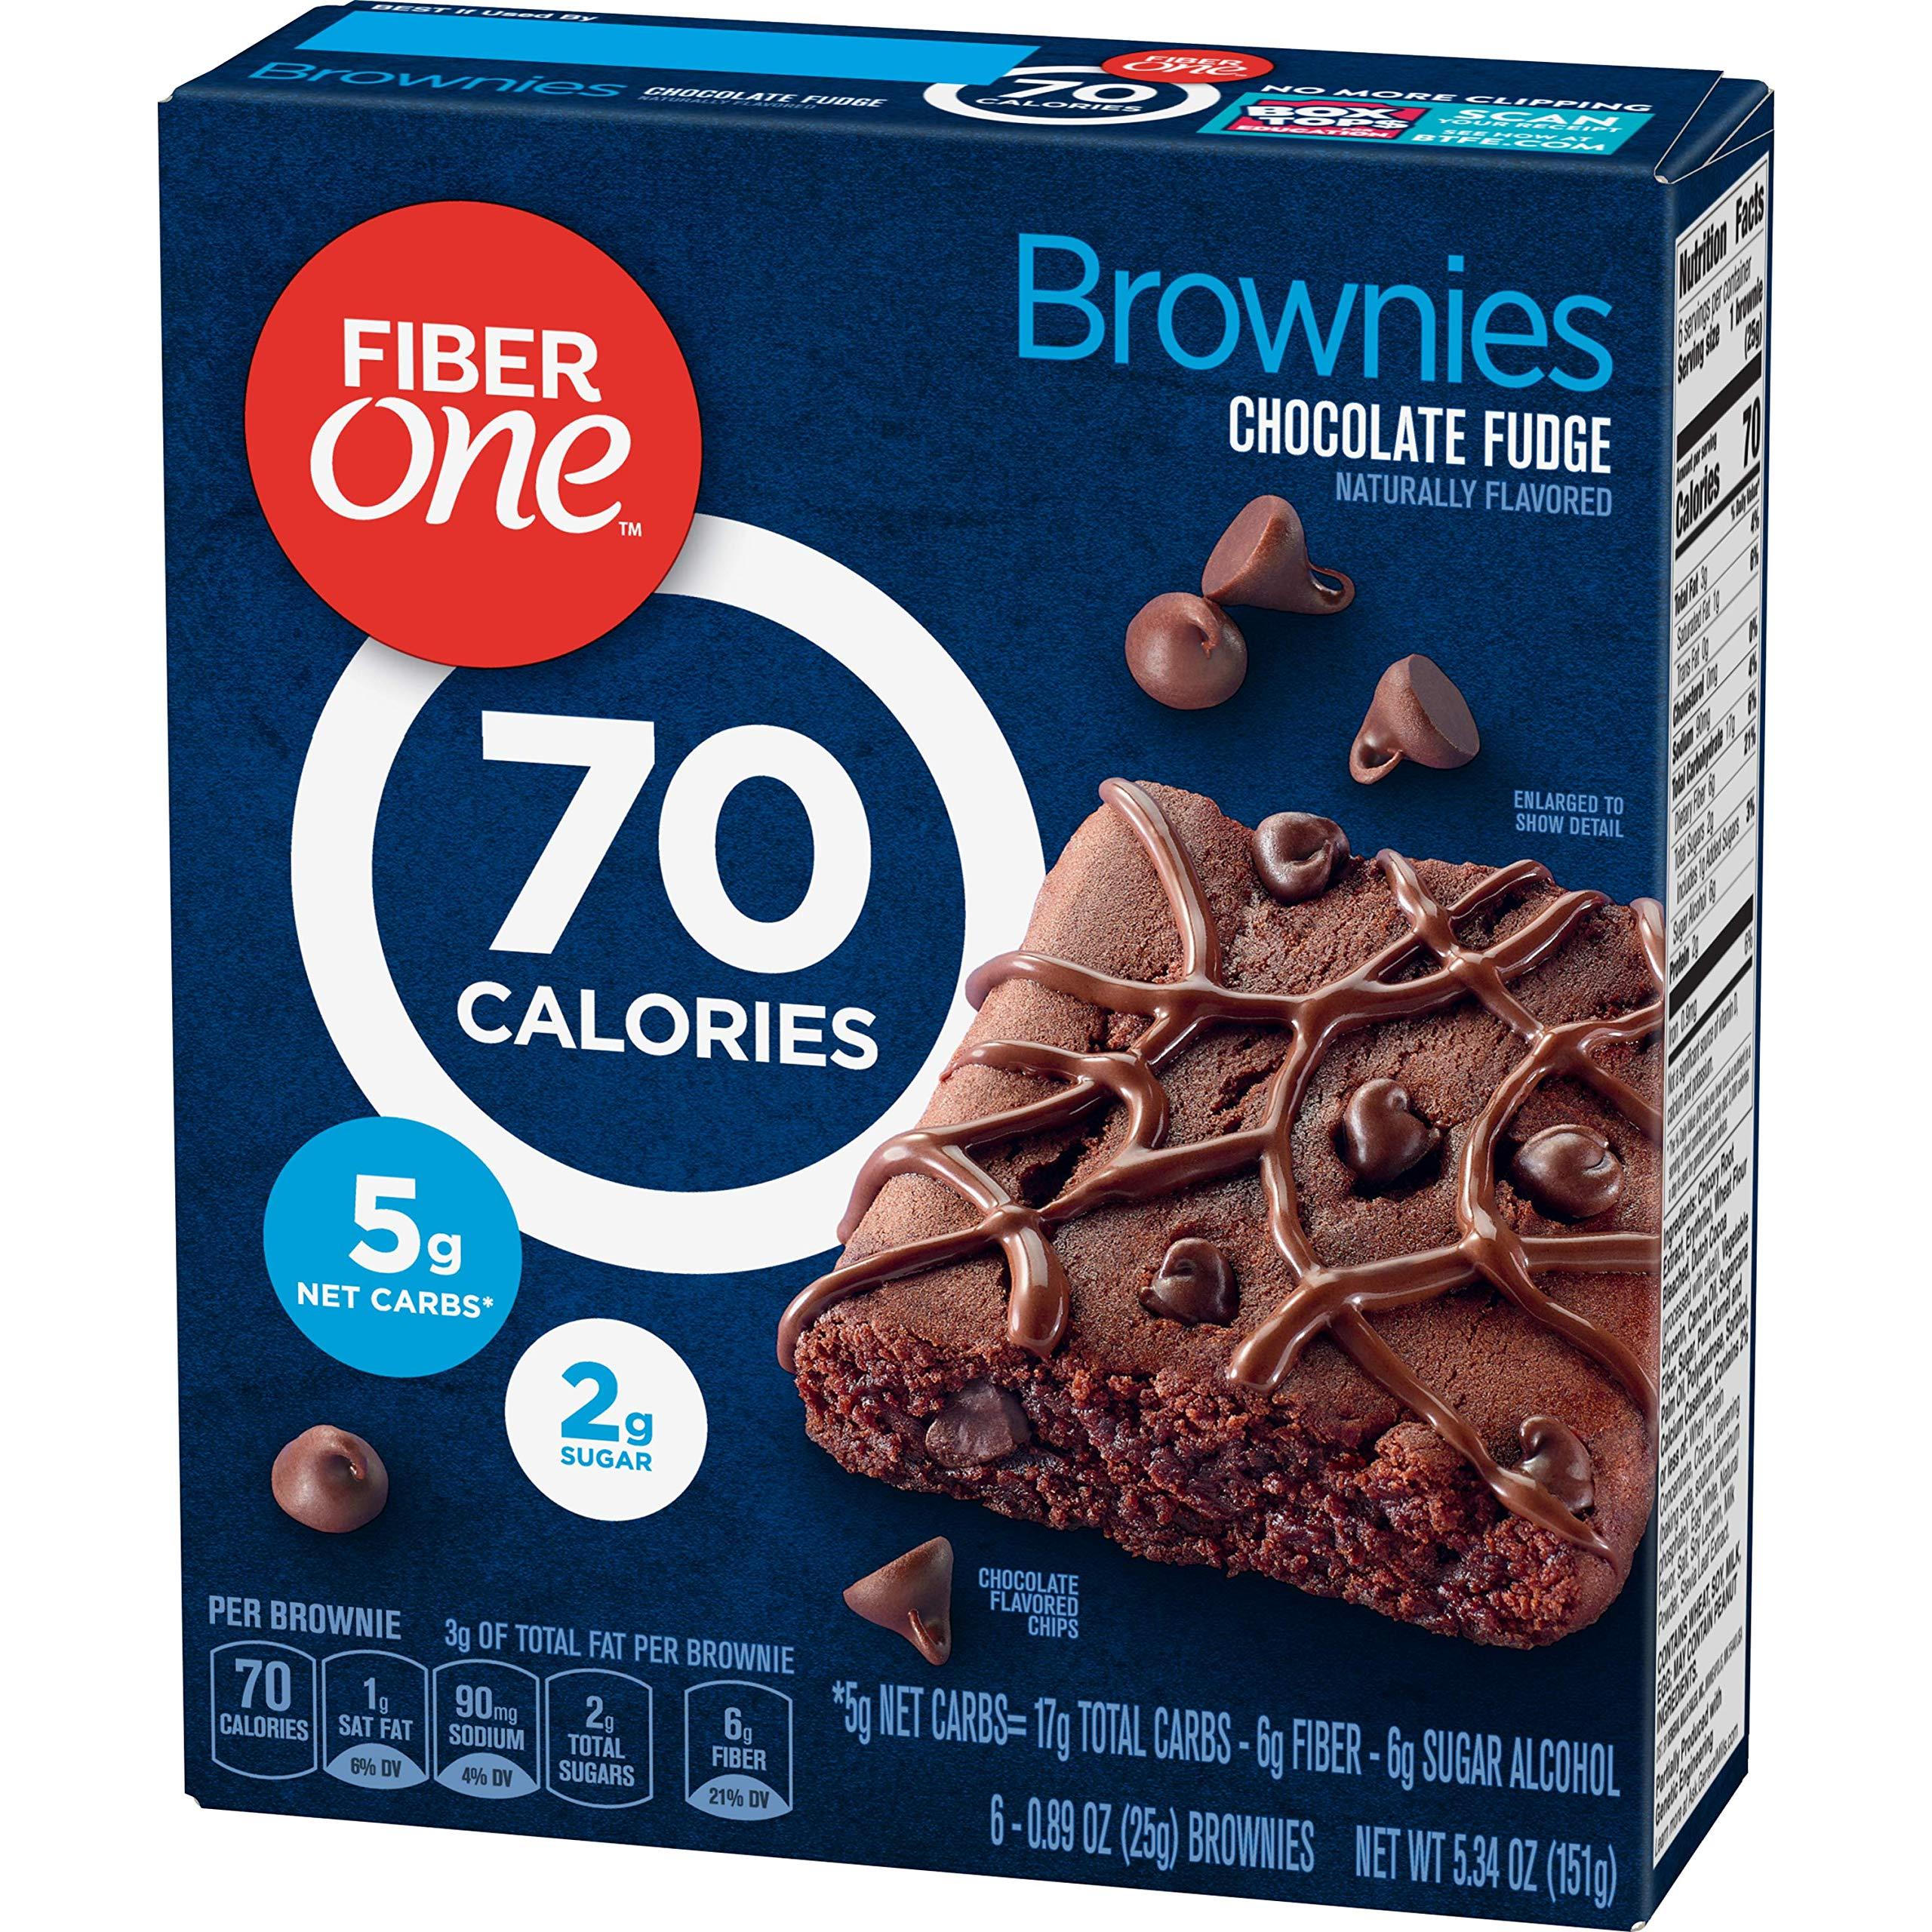 Fiber One Brownies, 70 Calorie Bar, 5 Net Carbs, Snacks, Chocolate Fudge, 6ct by Fiber One